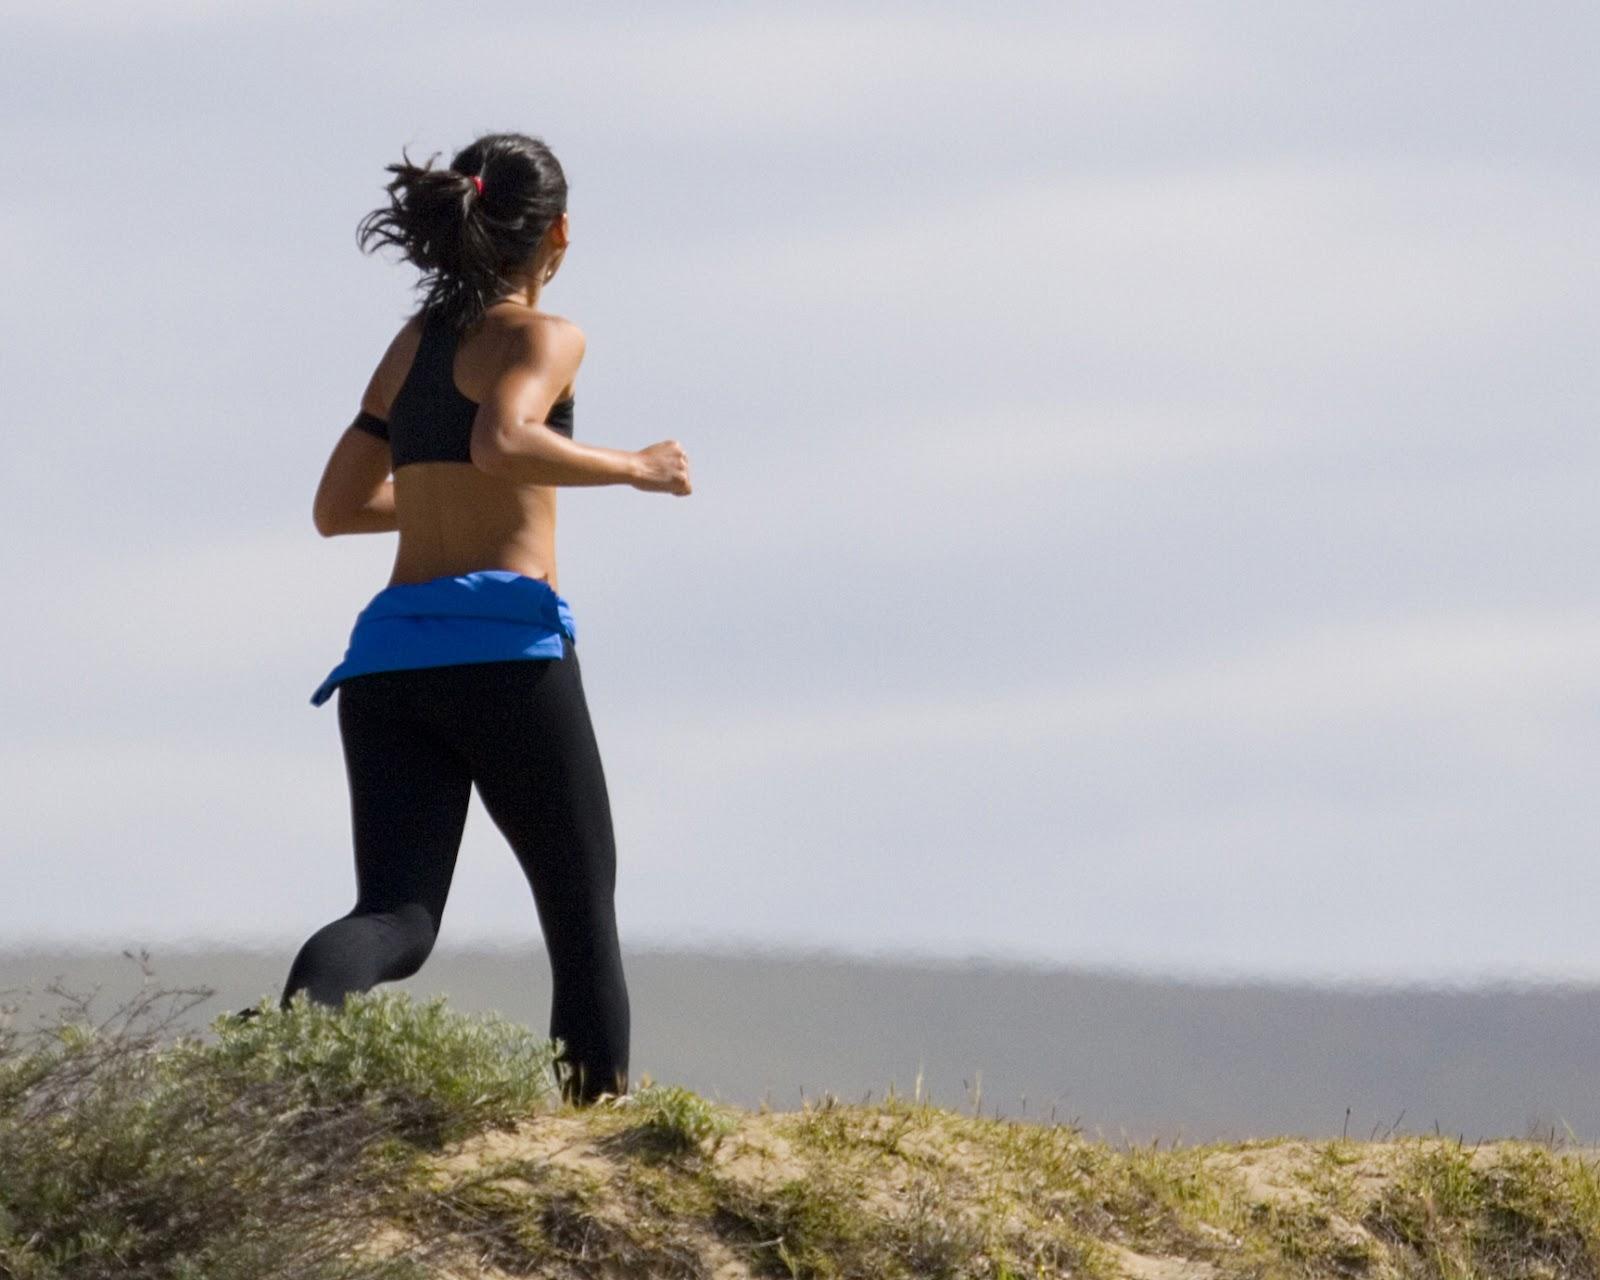 Jogging_Woman_in_Grass-3.jpg